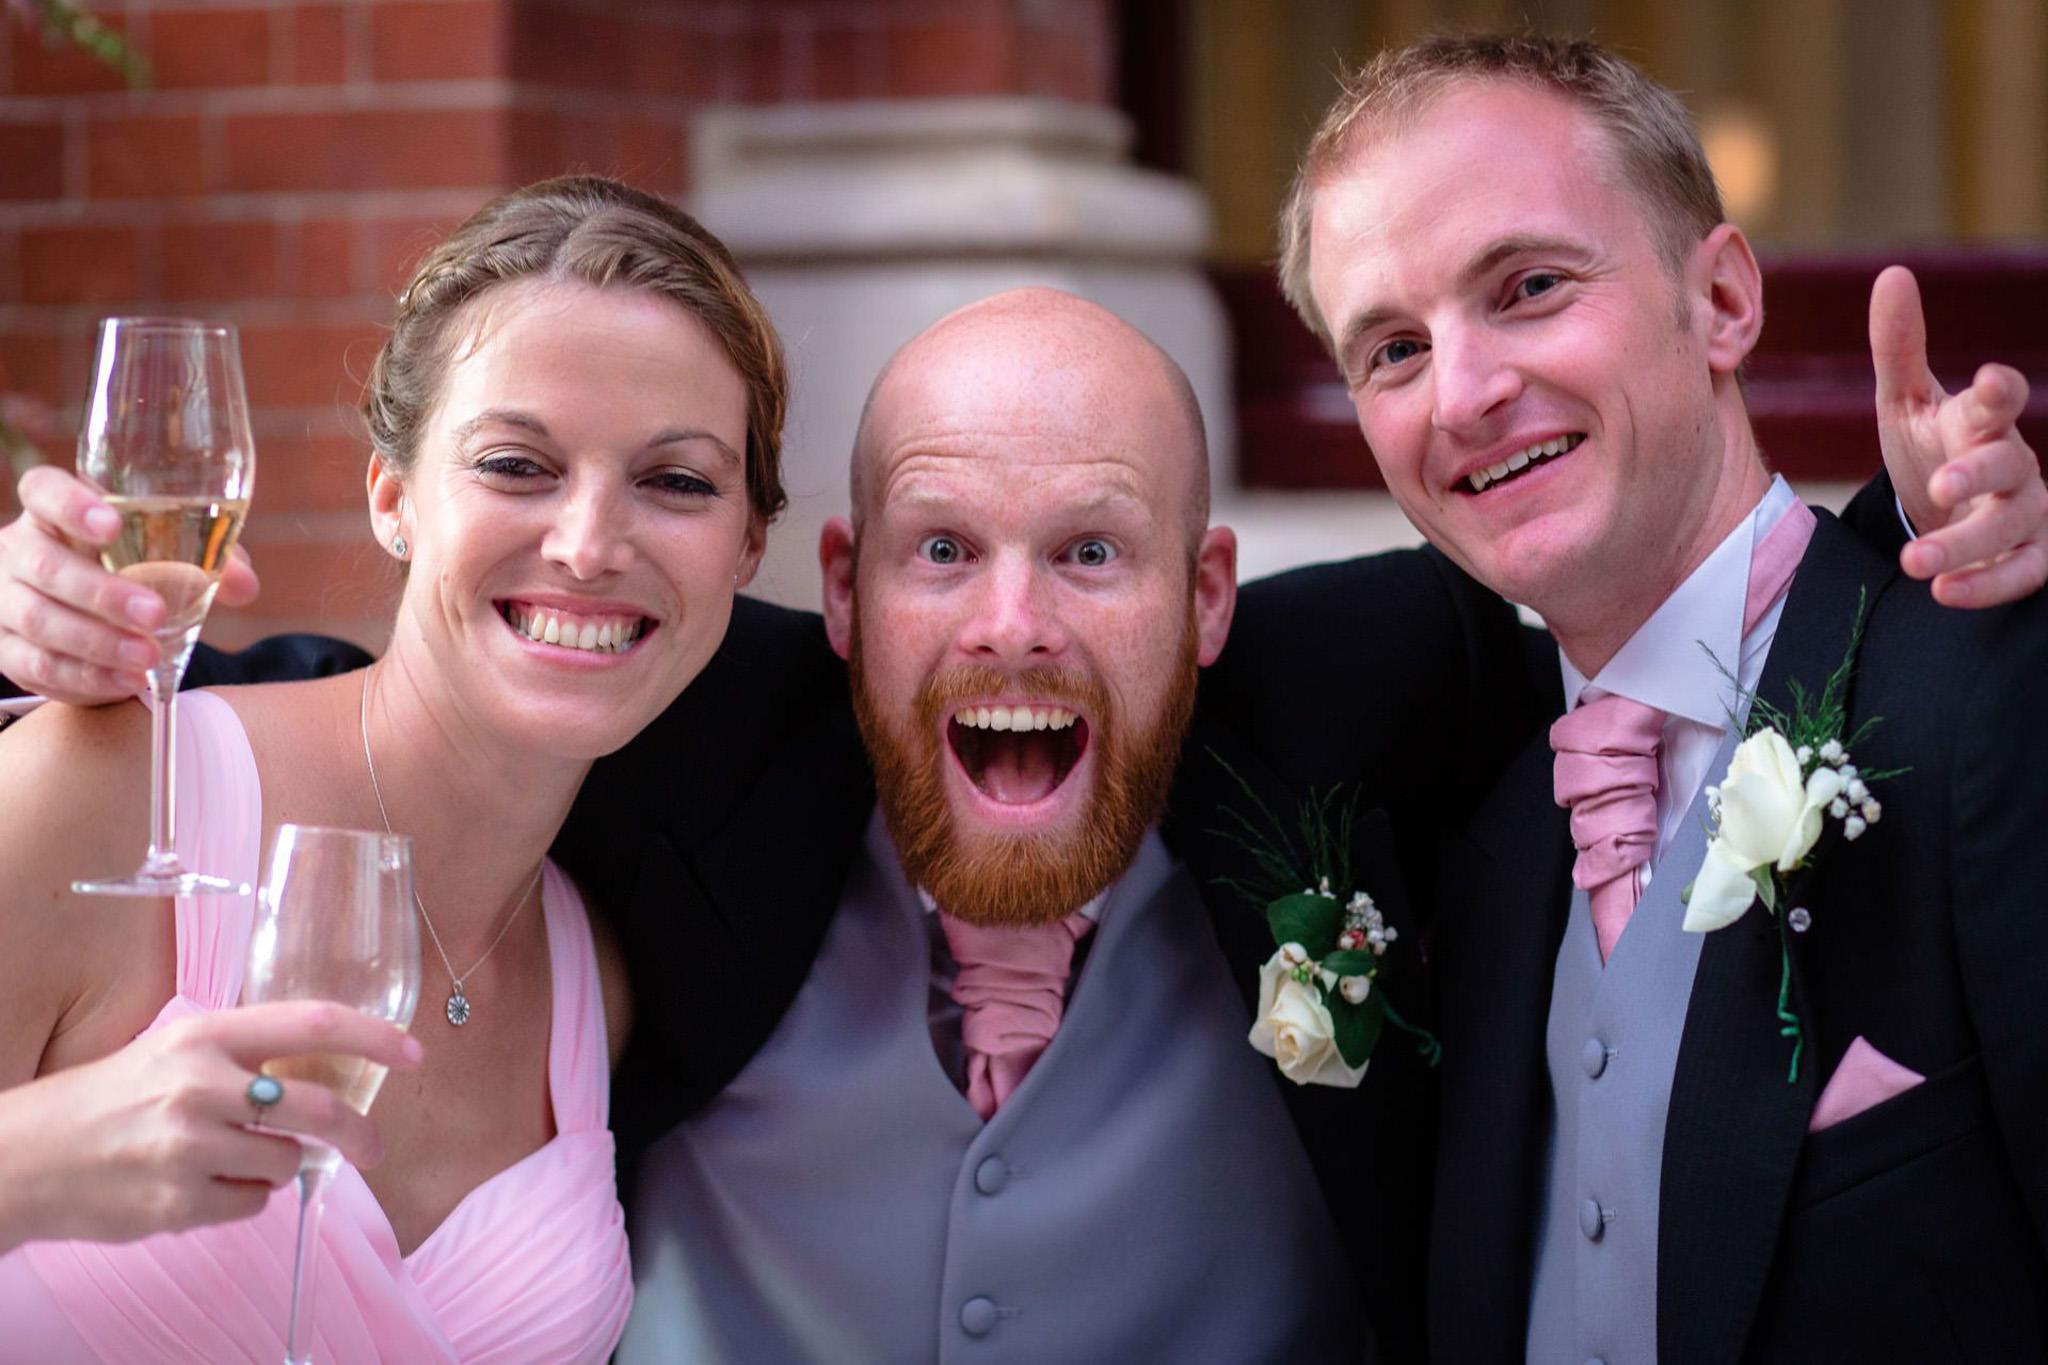 St. Pancras hotel wedding guests posing